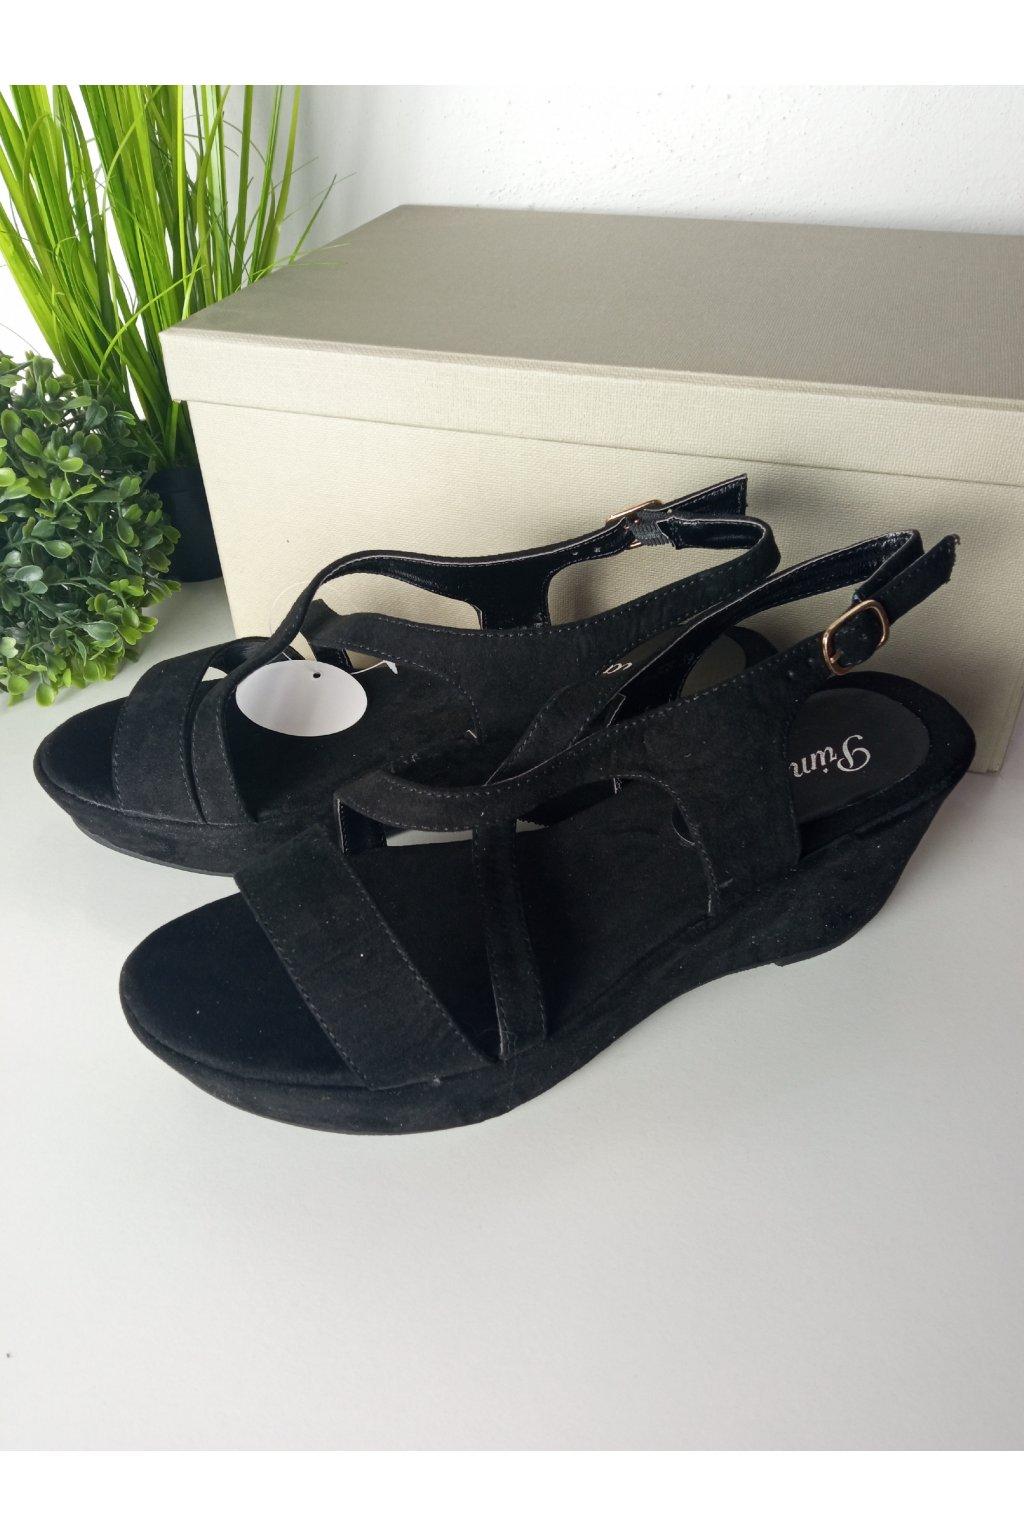 Čierne sandále NJSK 6-308B